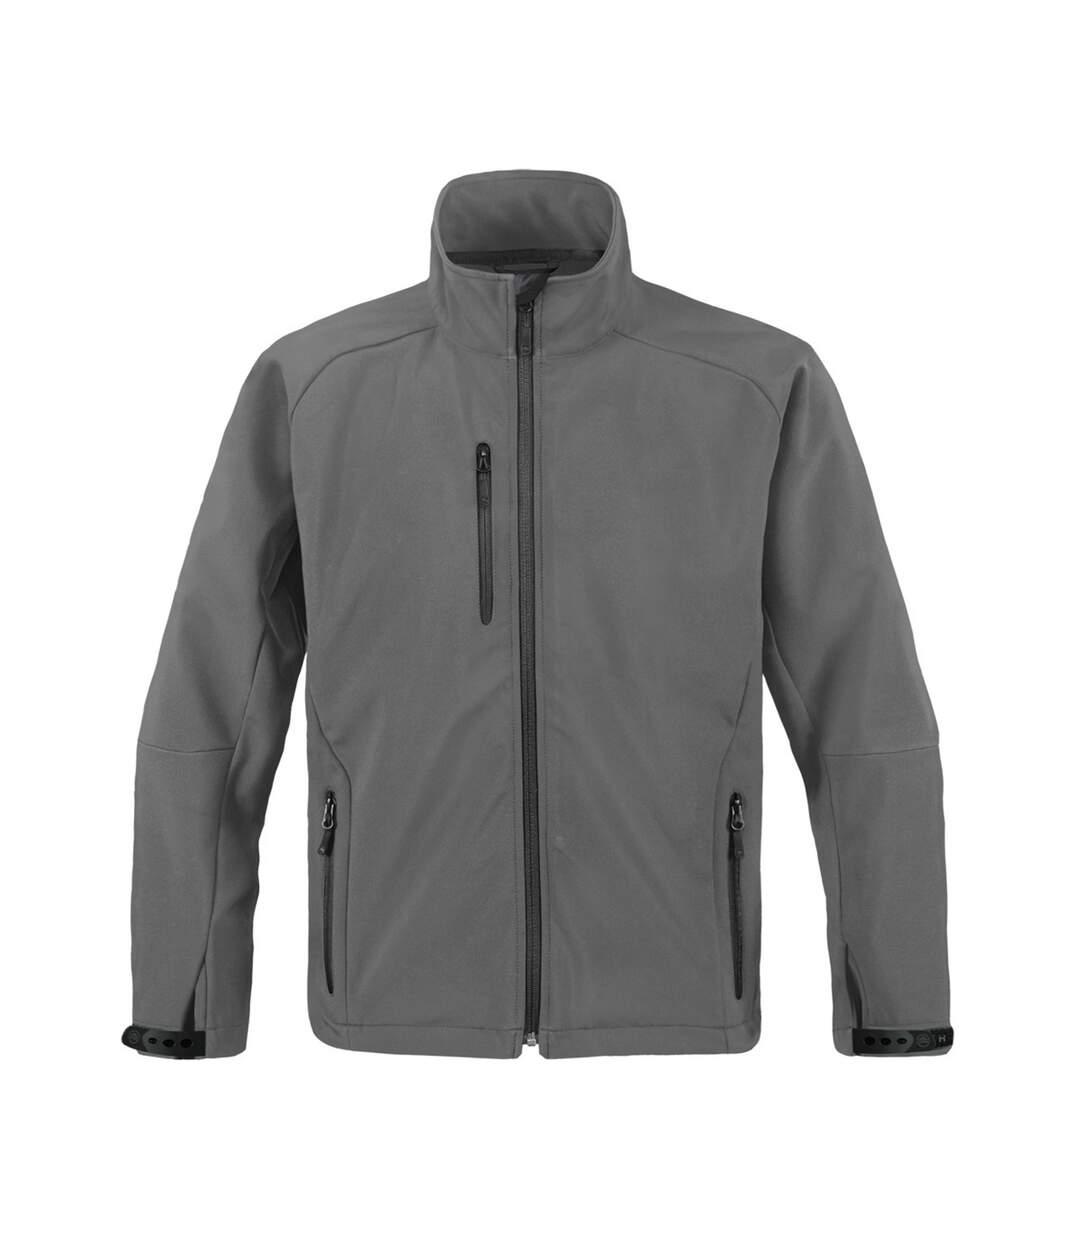 Stormtech Mens Ultra Light Softshell Jacket (Waterproof and Breathable) (Granite) - UTBC3067